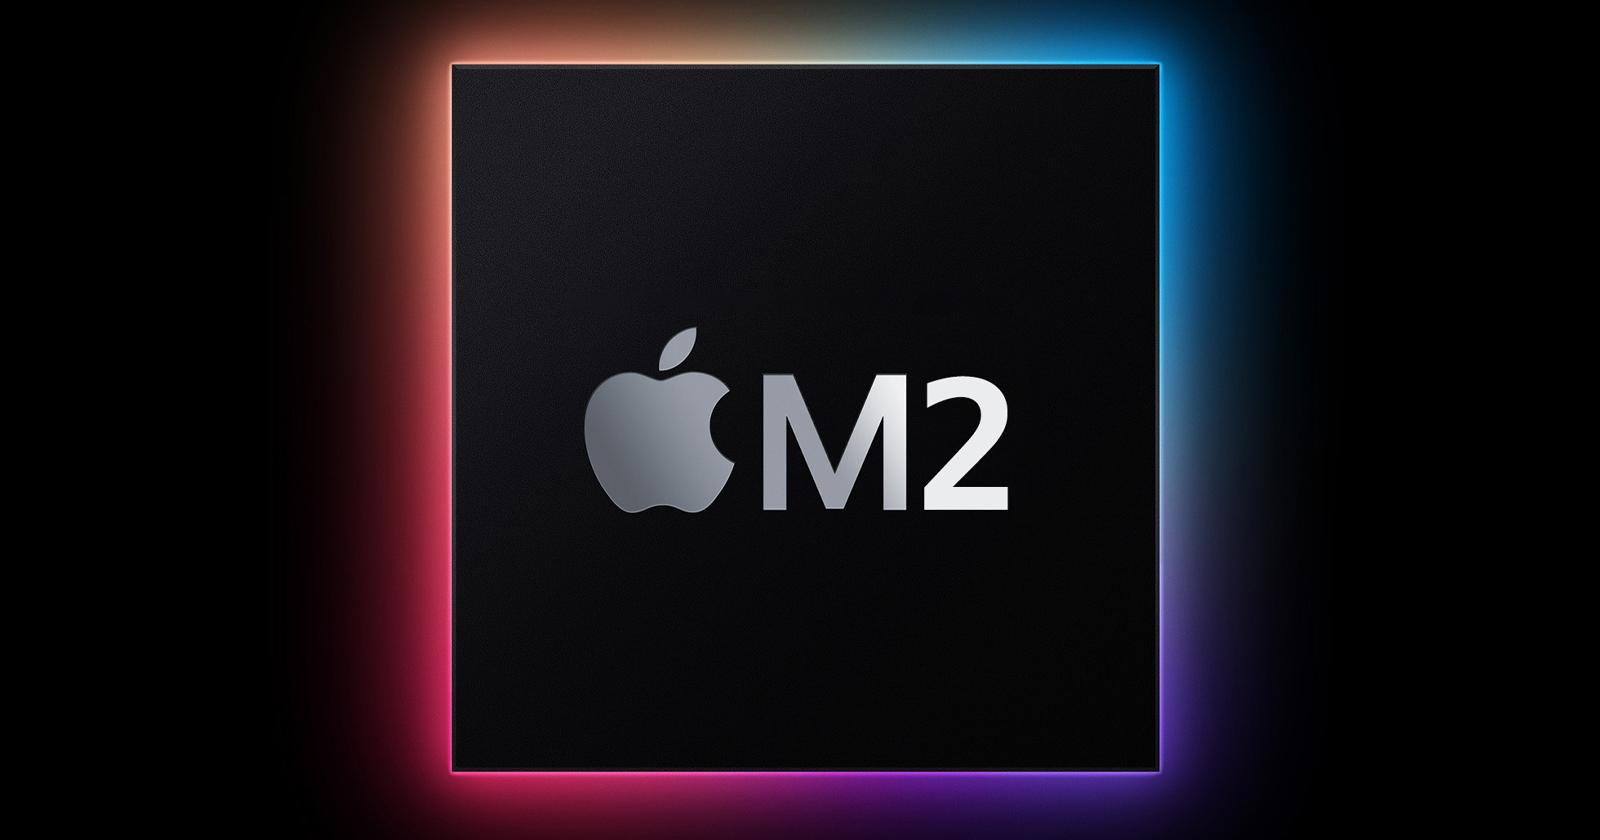 H Apple είναι έτοιμη να ξεκινήσει την παραγωγή του M2 chip